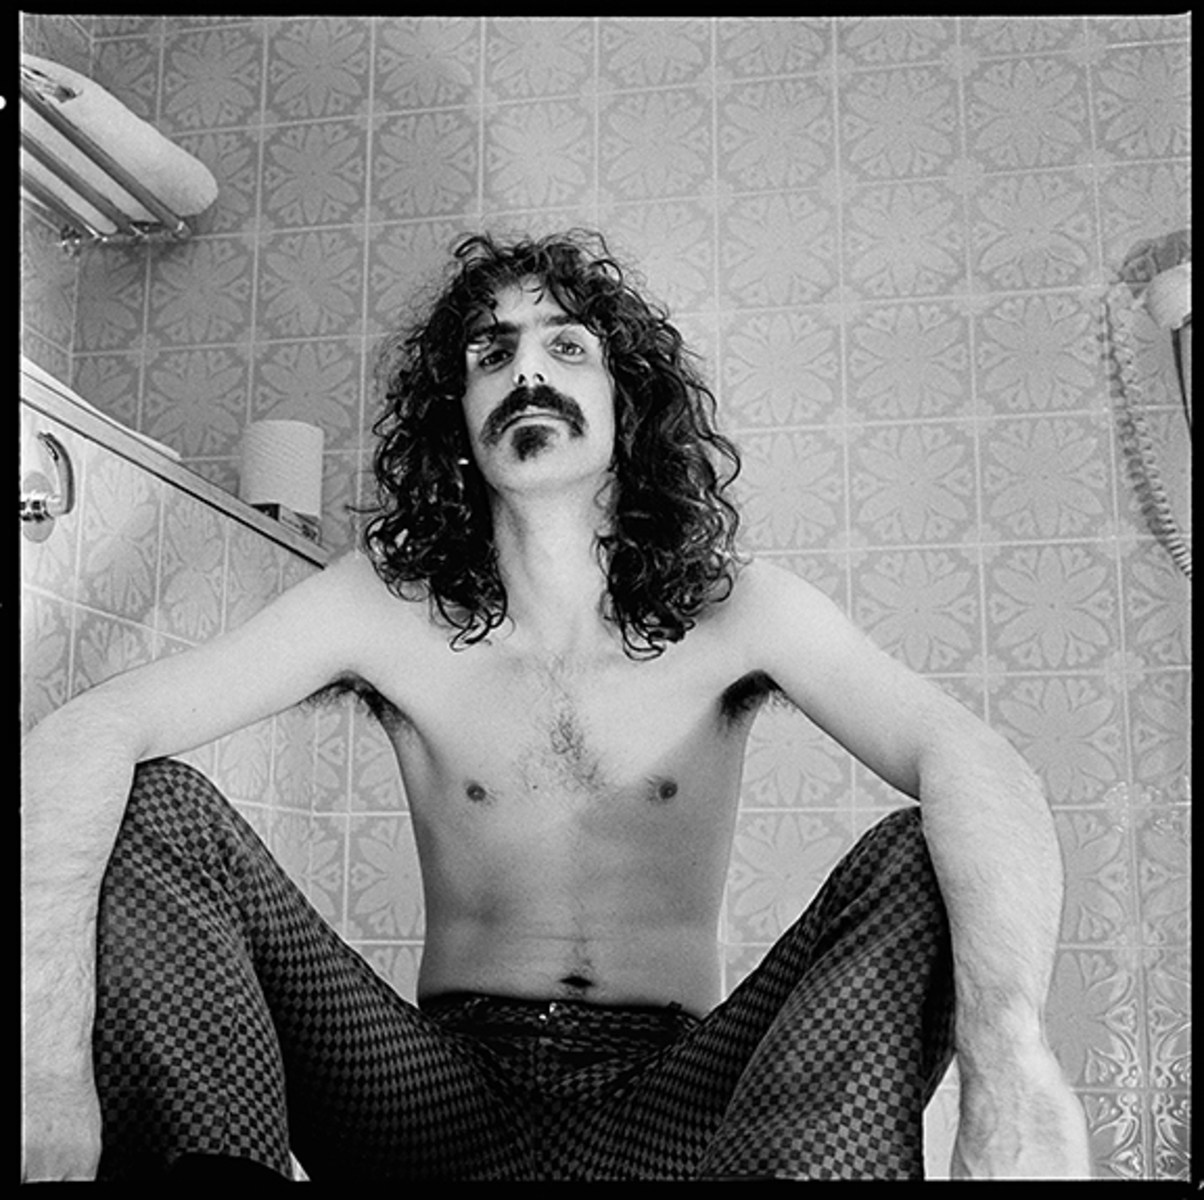 ZAPPA KRAPPA 3 Frank Zappa by Robert Davidson